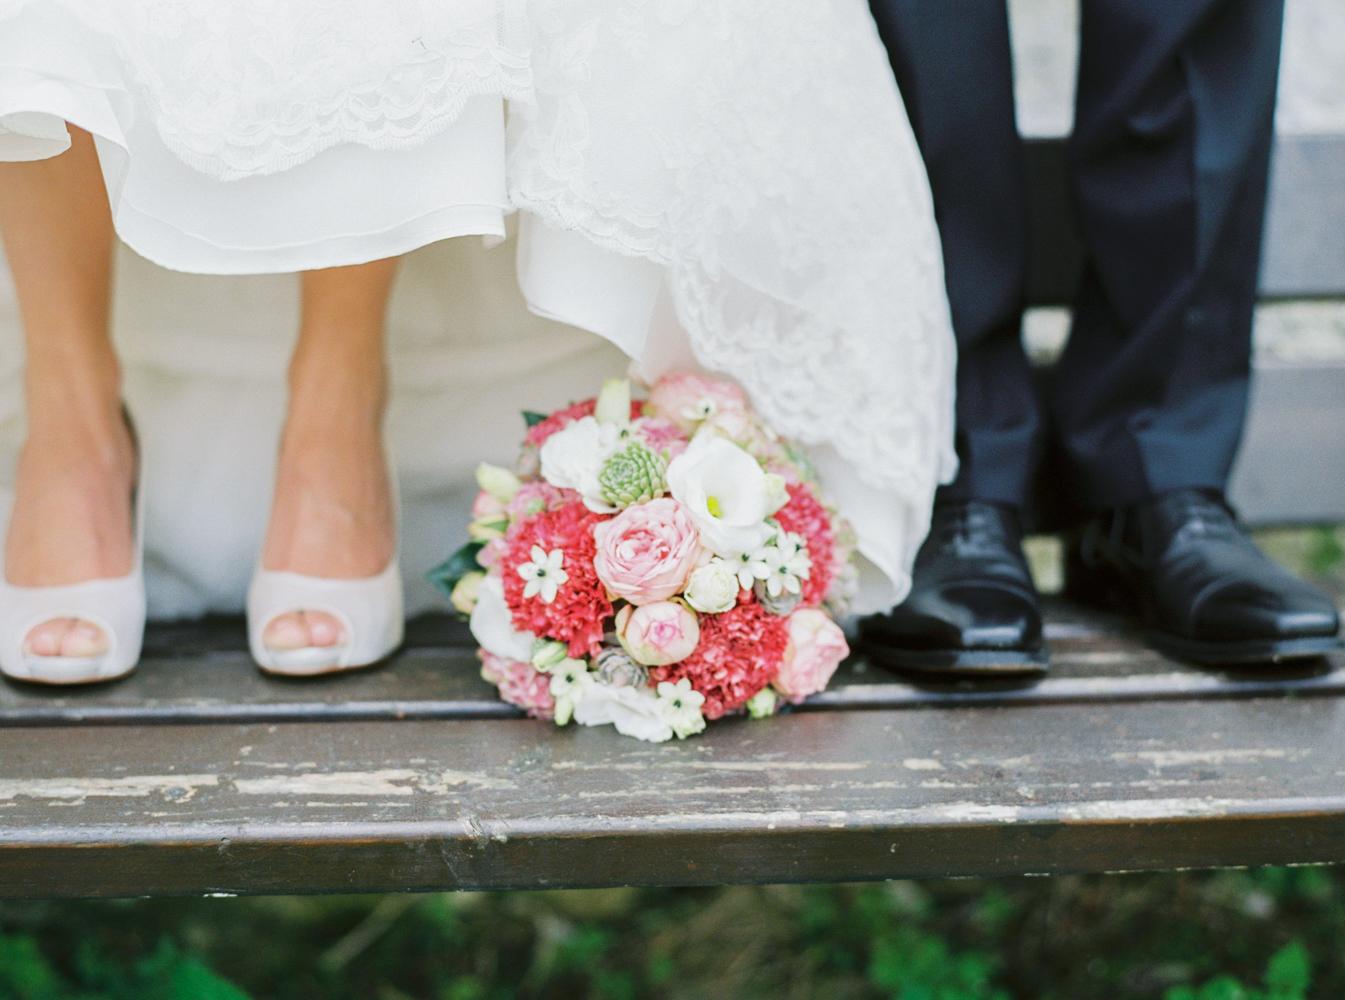 Hochzeitsfotograf_Stuttgart_Karoline_Kirchhof (2).jpg